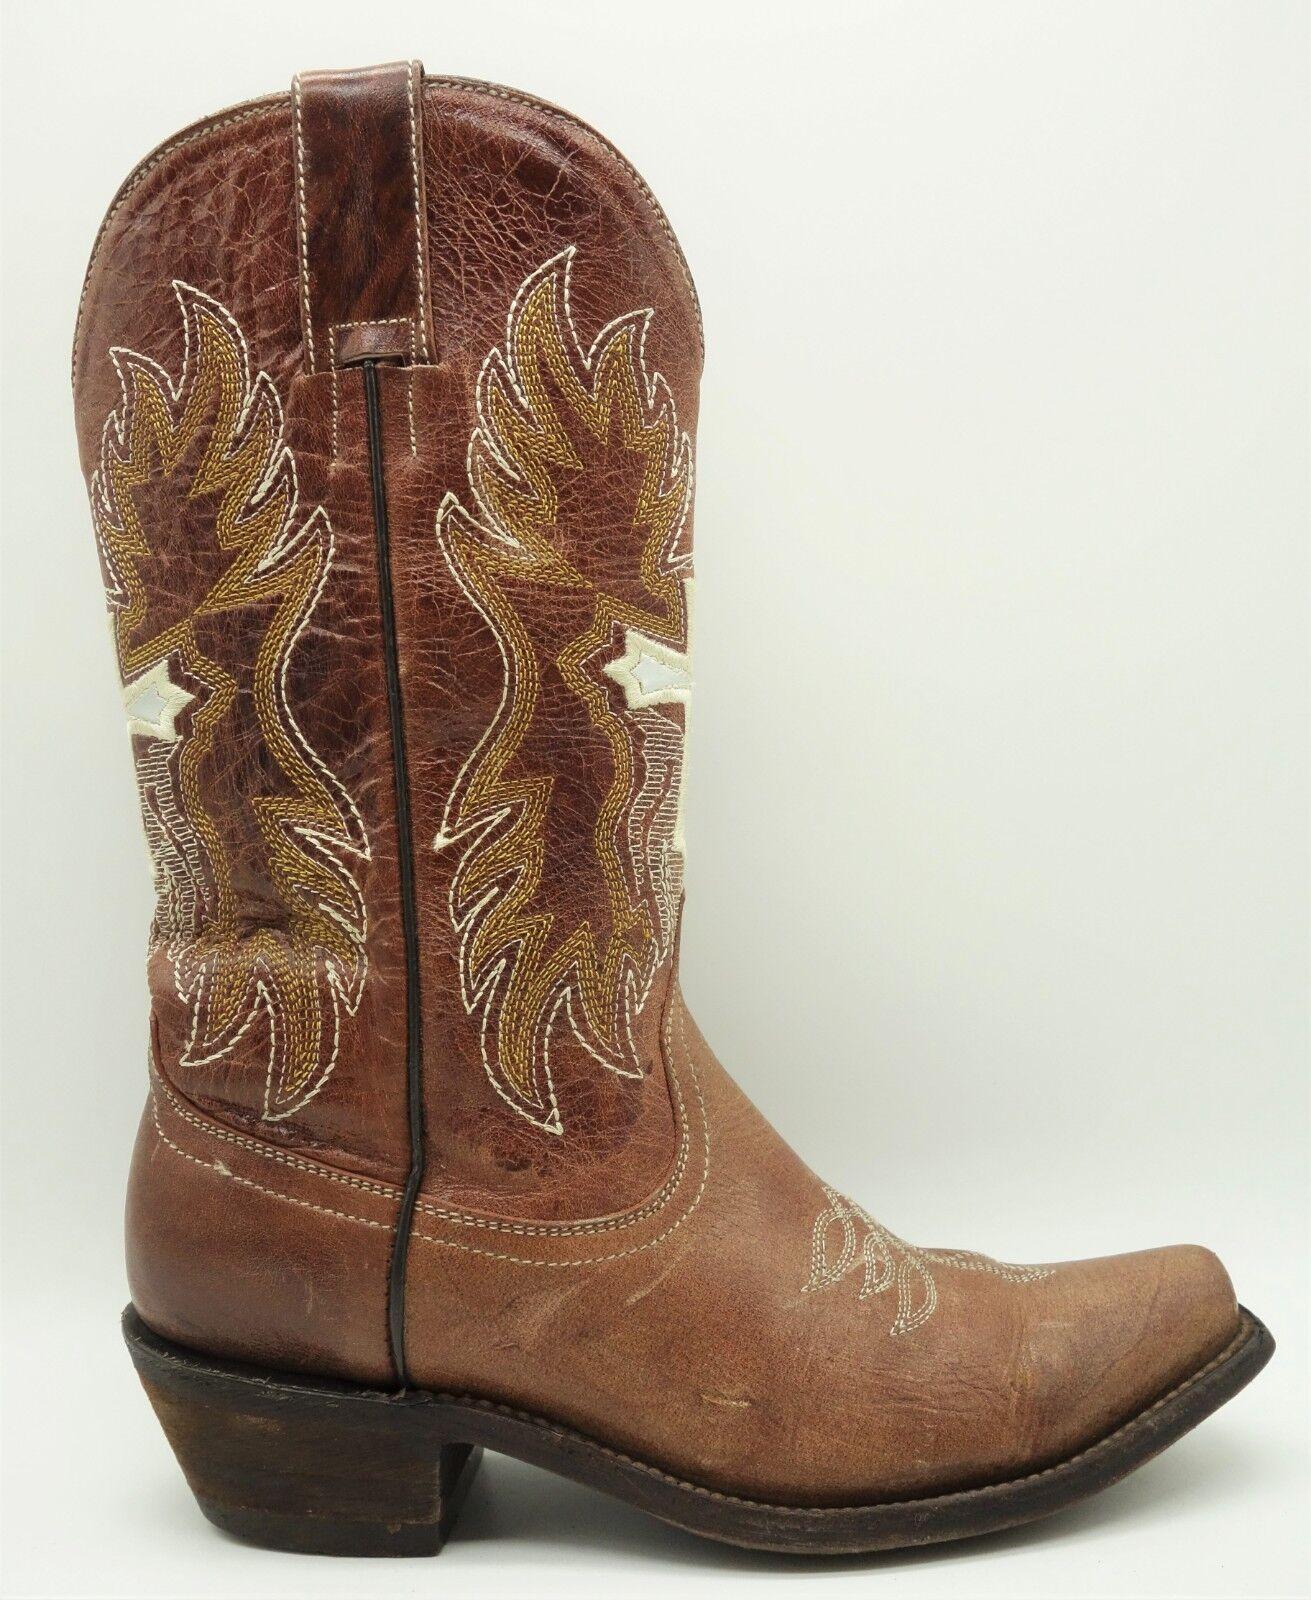 Pecos Bill marron Leather Western Cowboy Cross Embroiderouge bottes femmes's 6.5